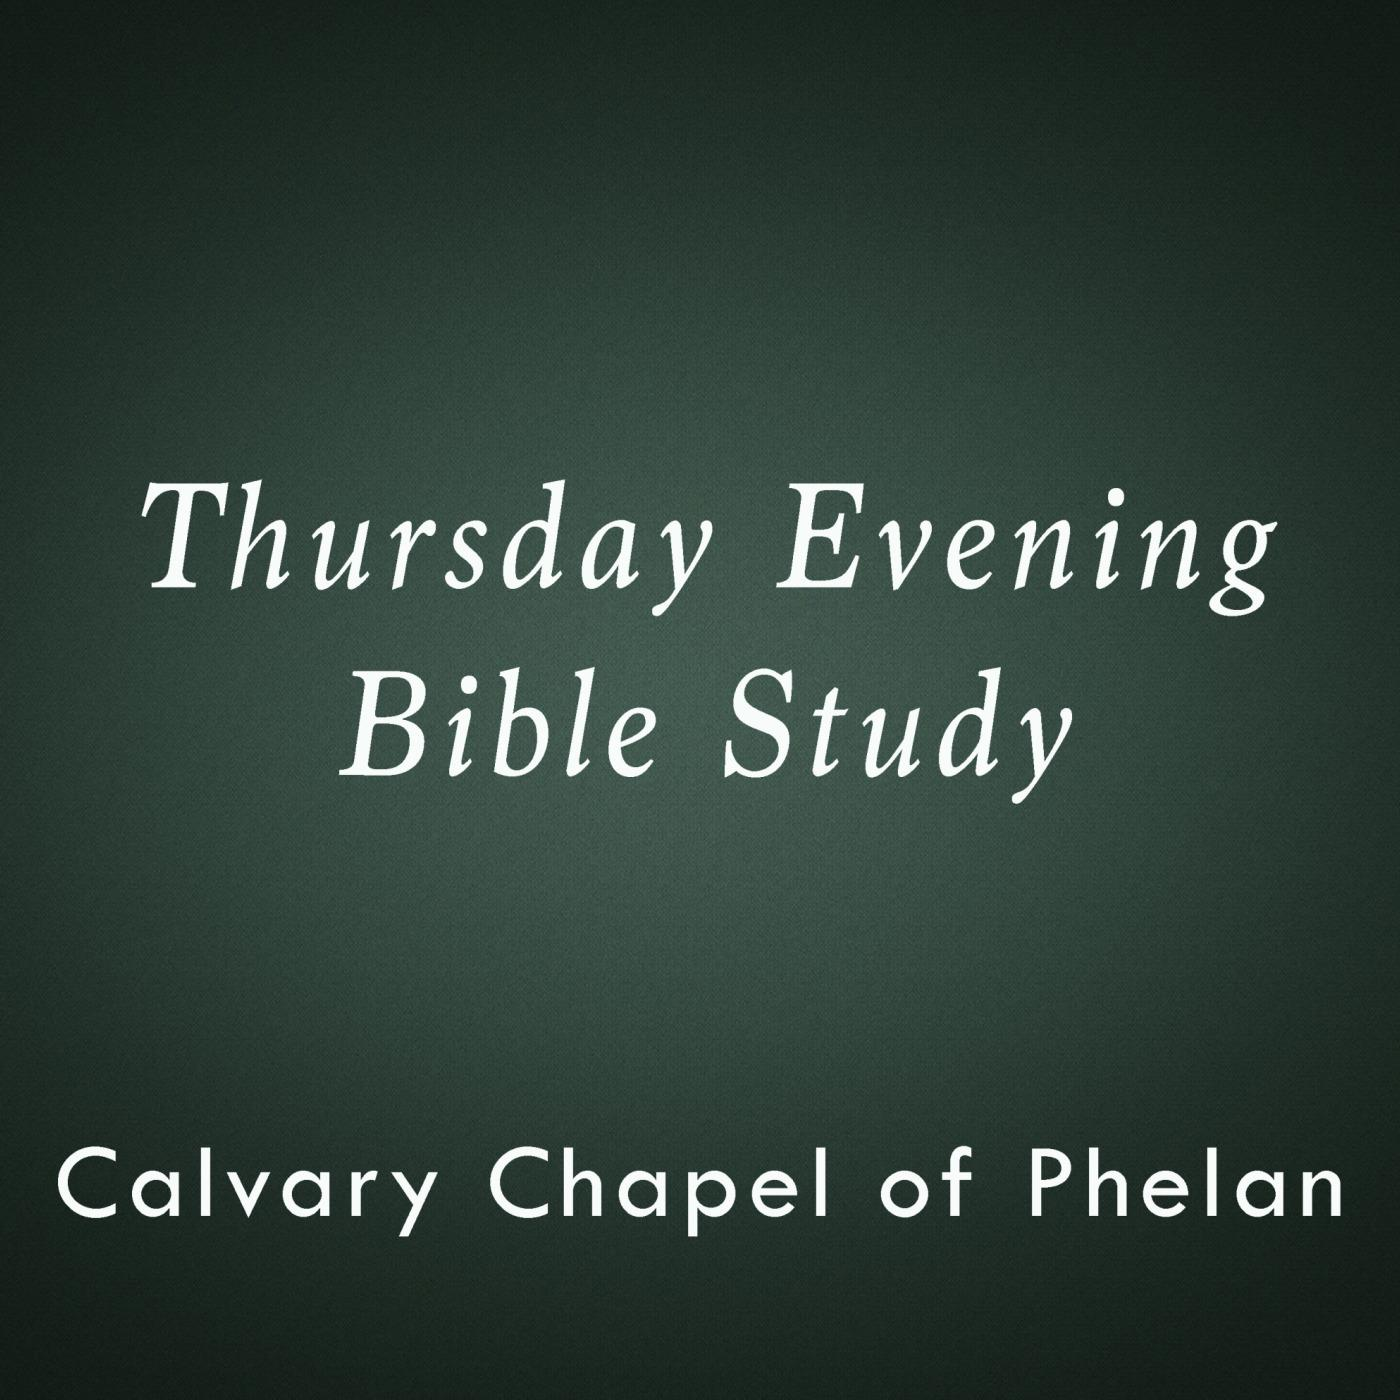 Calvary Chapel of Phelan - Mid-week study (podcast) - Pastor